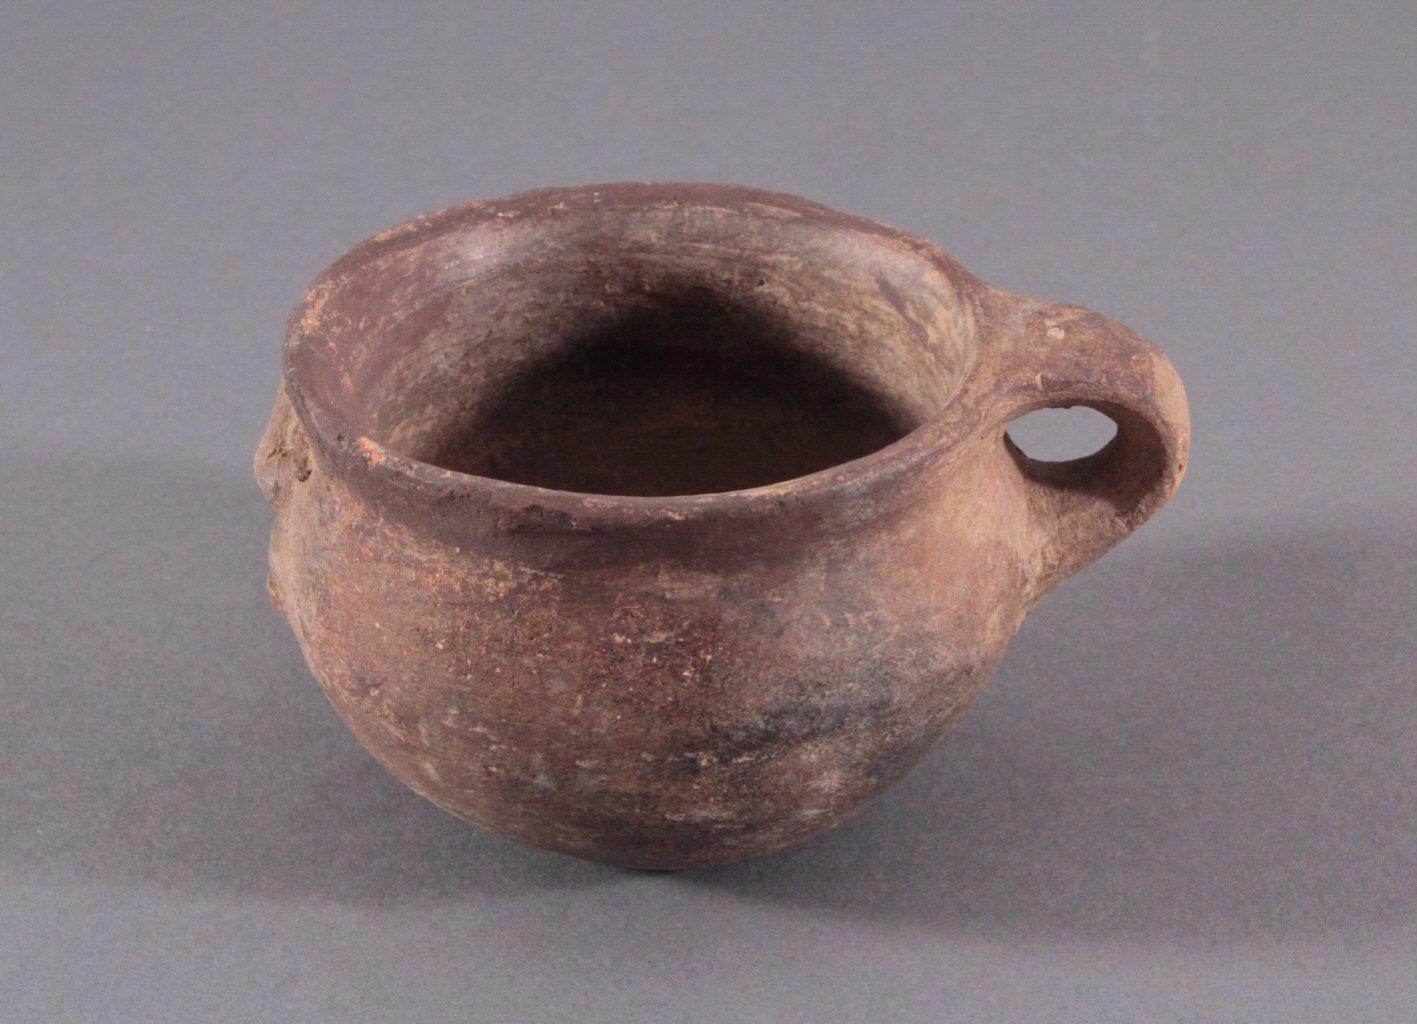 Einhenkelgefäß – Lausitzer Kultur 900-500 v. Chr.-3